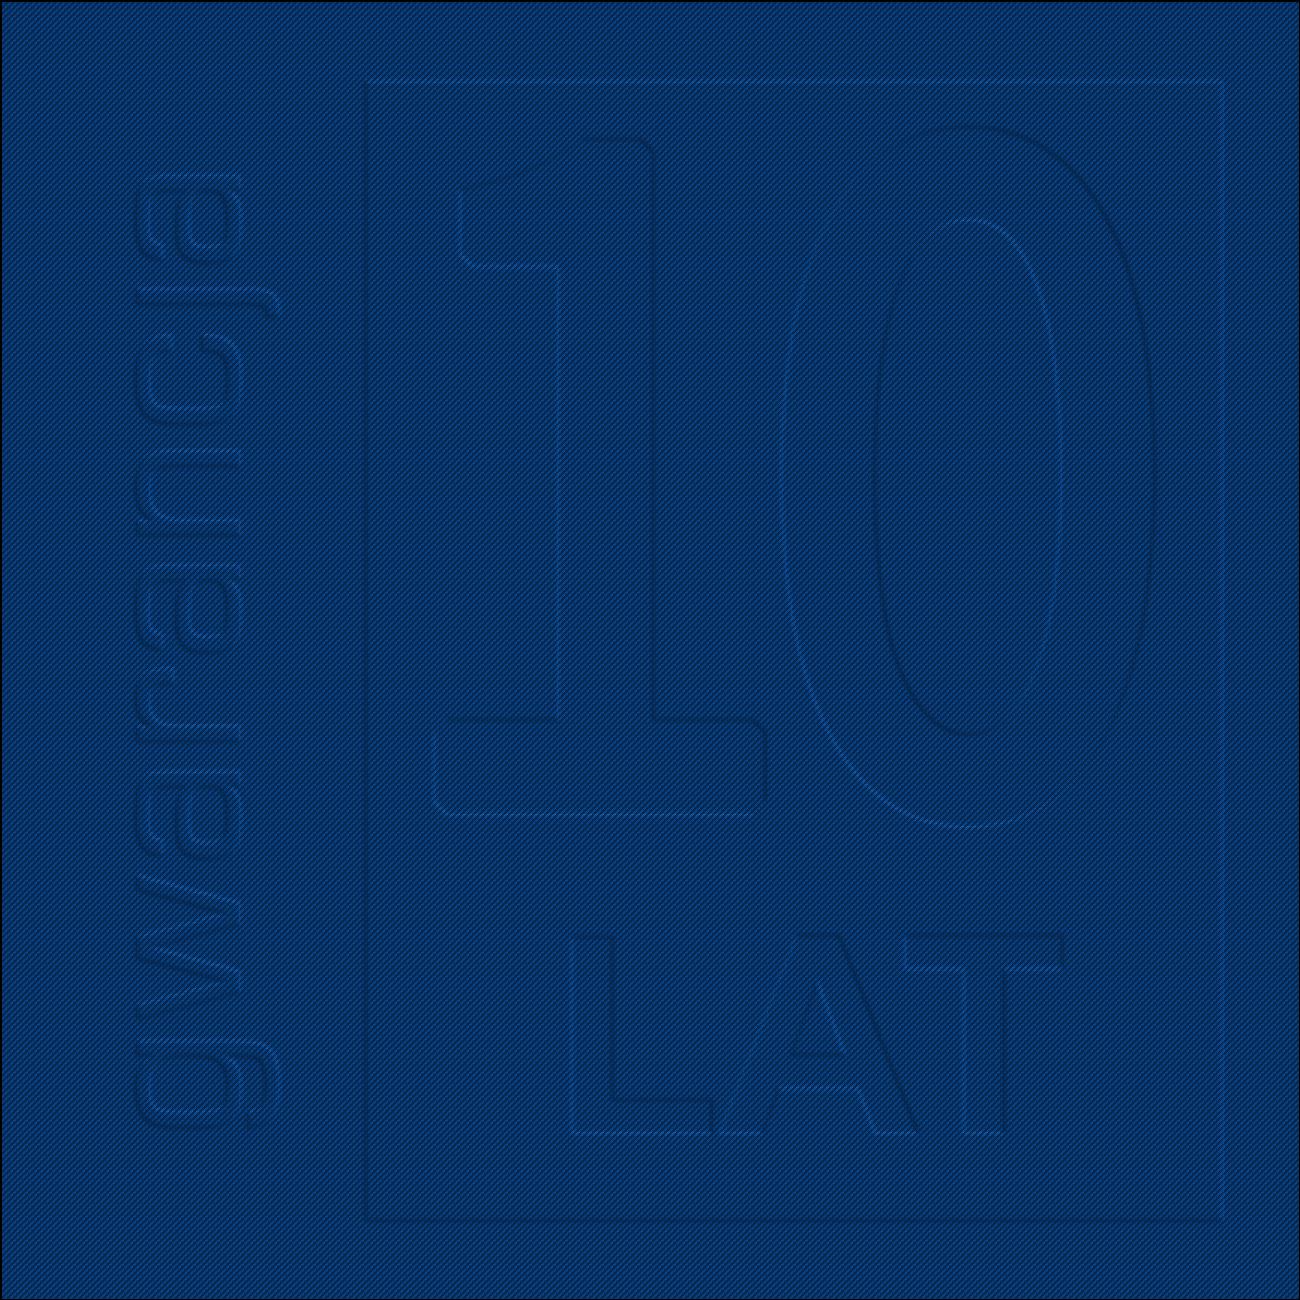 10 lat gwarancji na kocioł